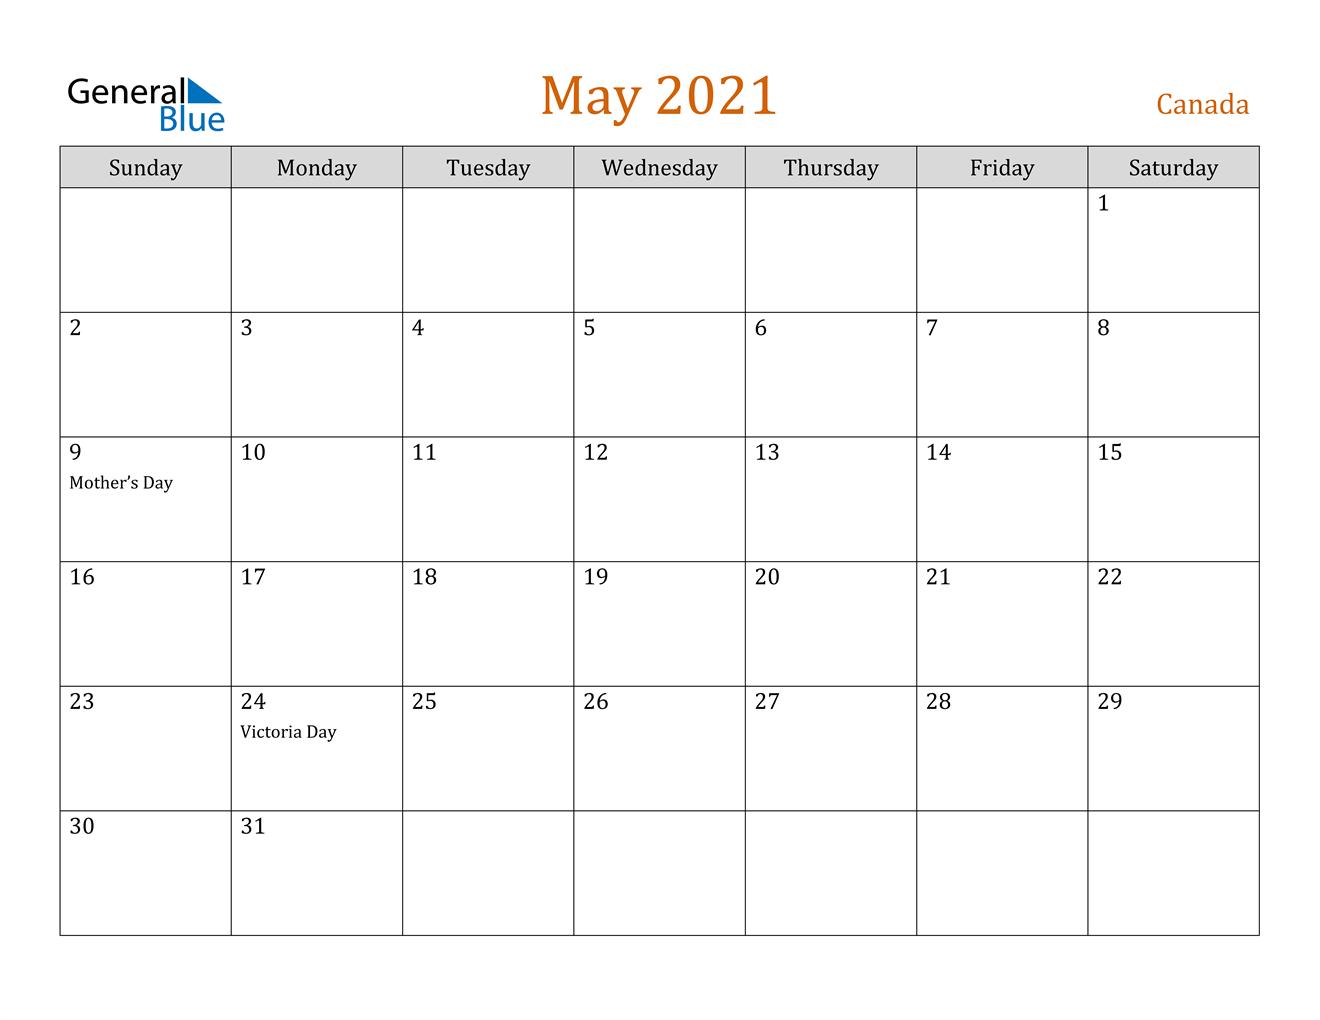 May 2021 Calendar - Canada